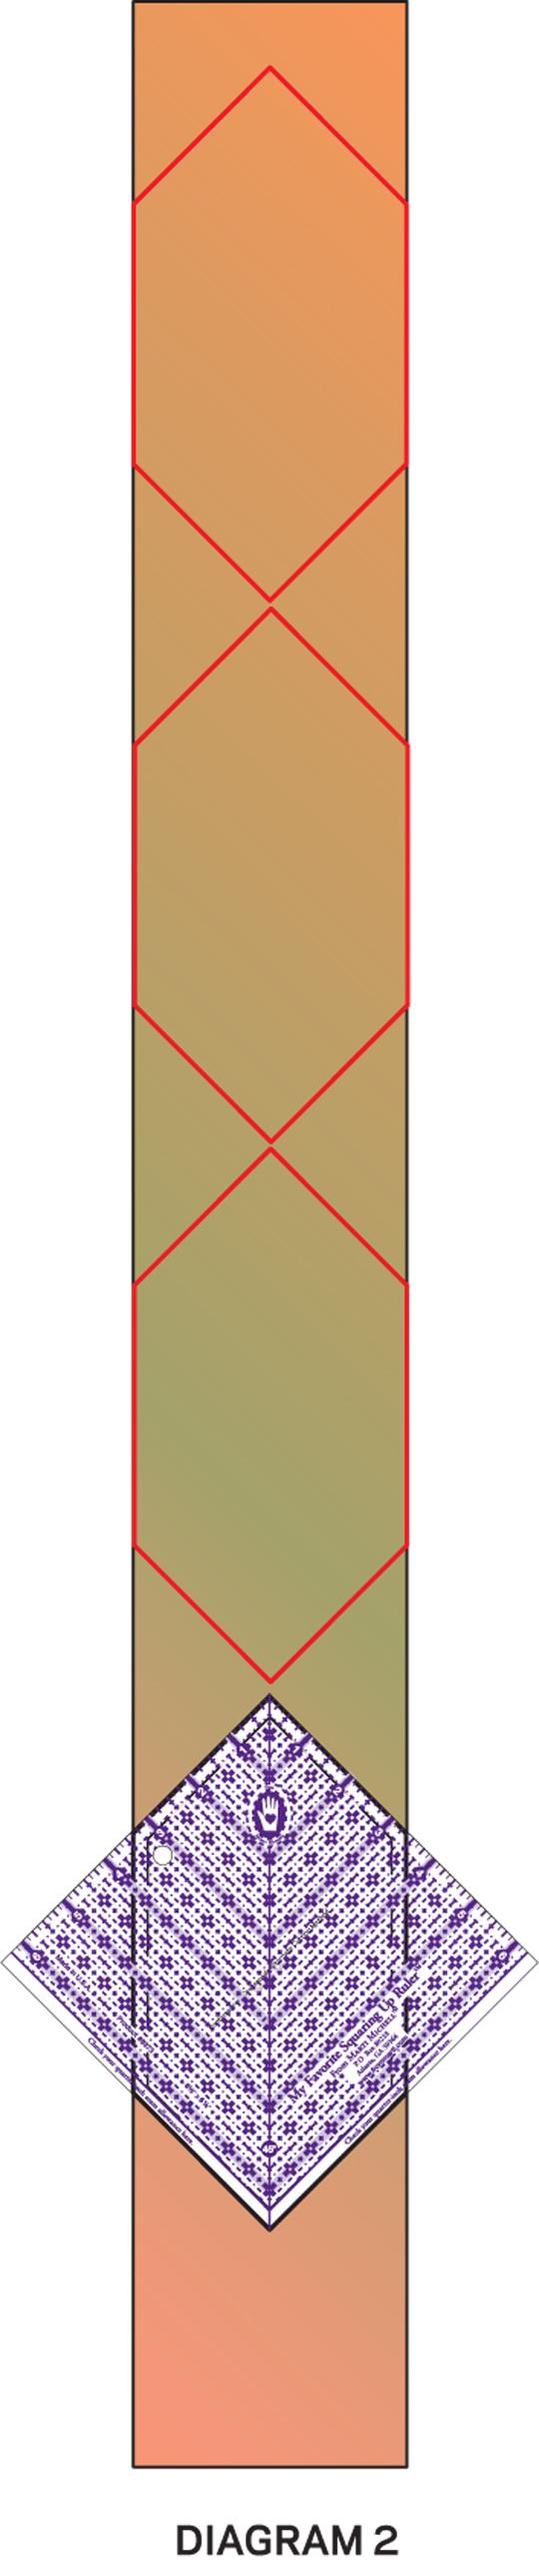 img_alt-cut-crossroadslg_1b.jpg